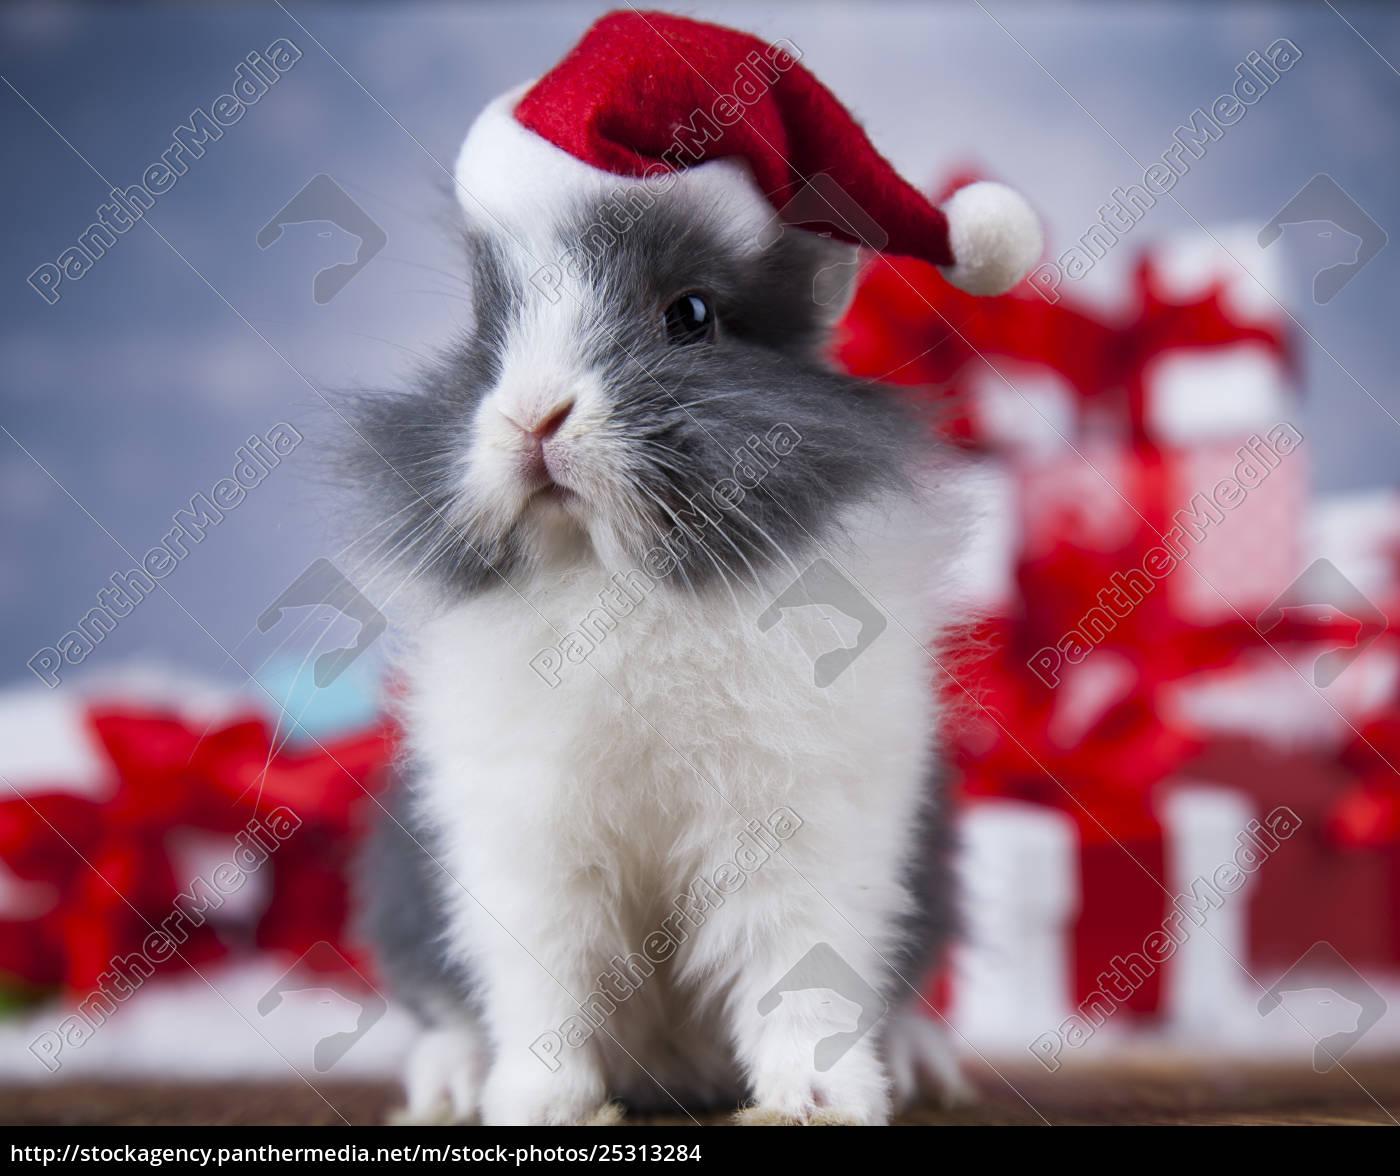 little, bunny, funny, rabbit, on, christmas, background - 25313284